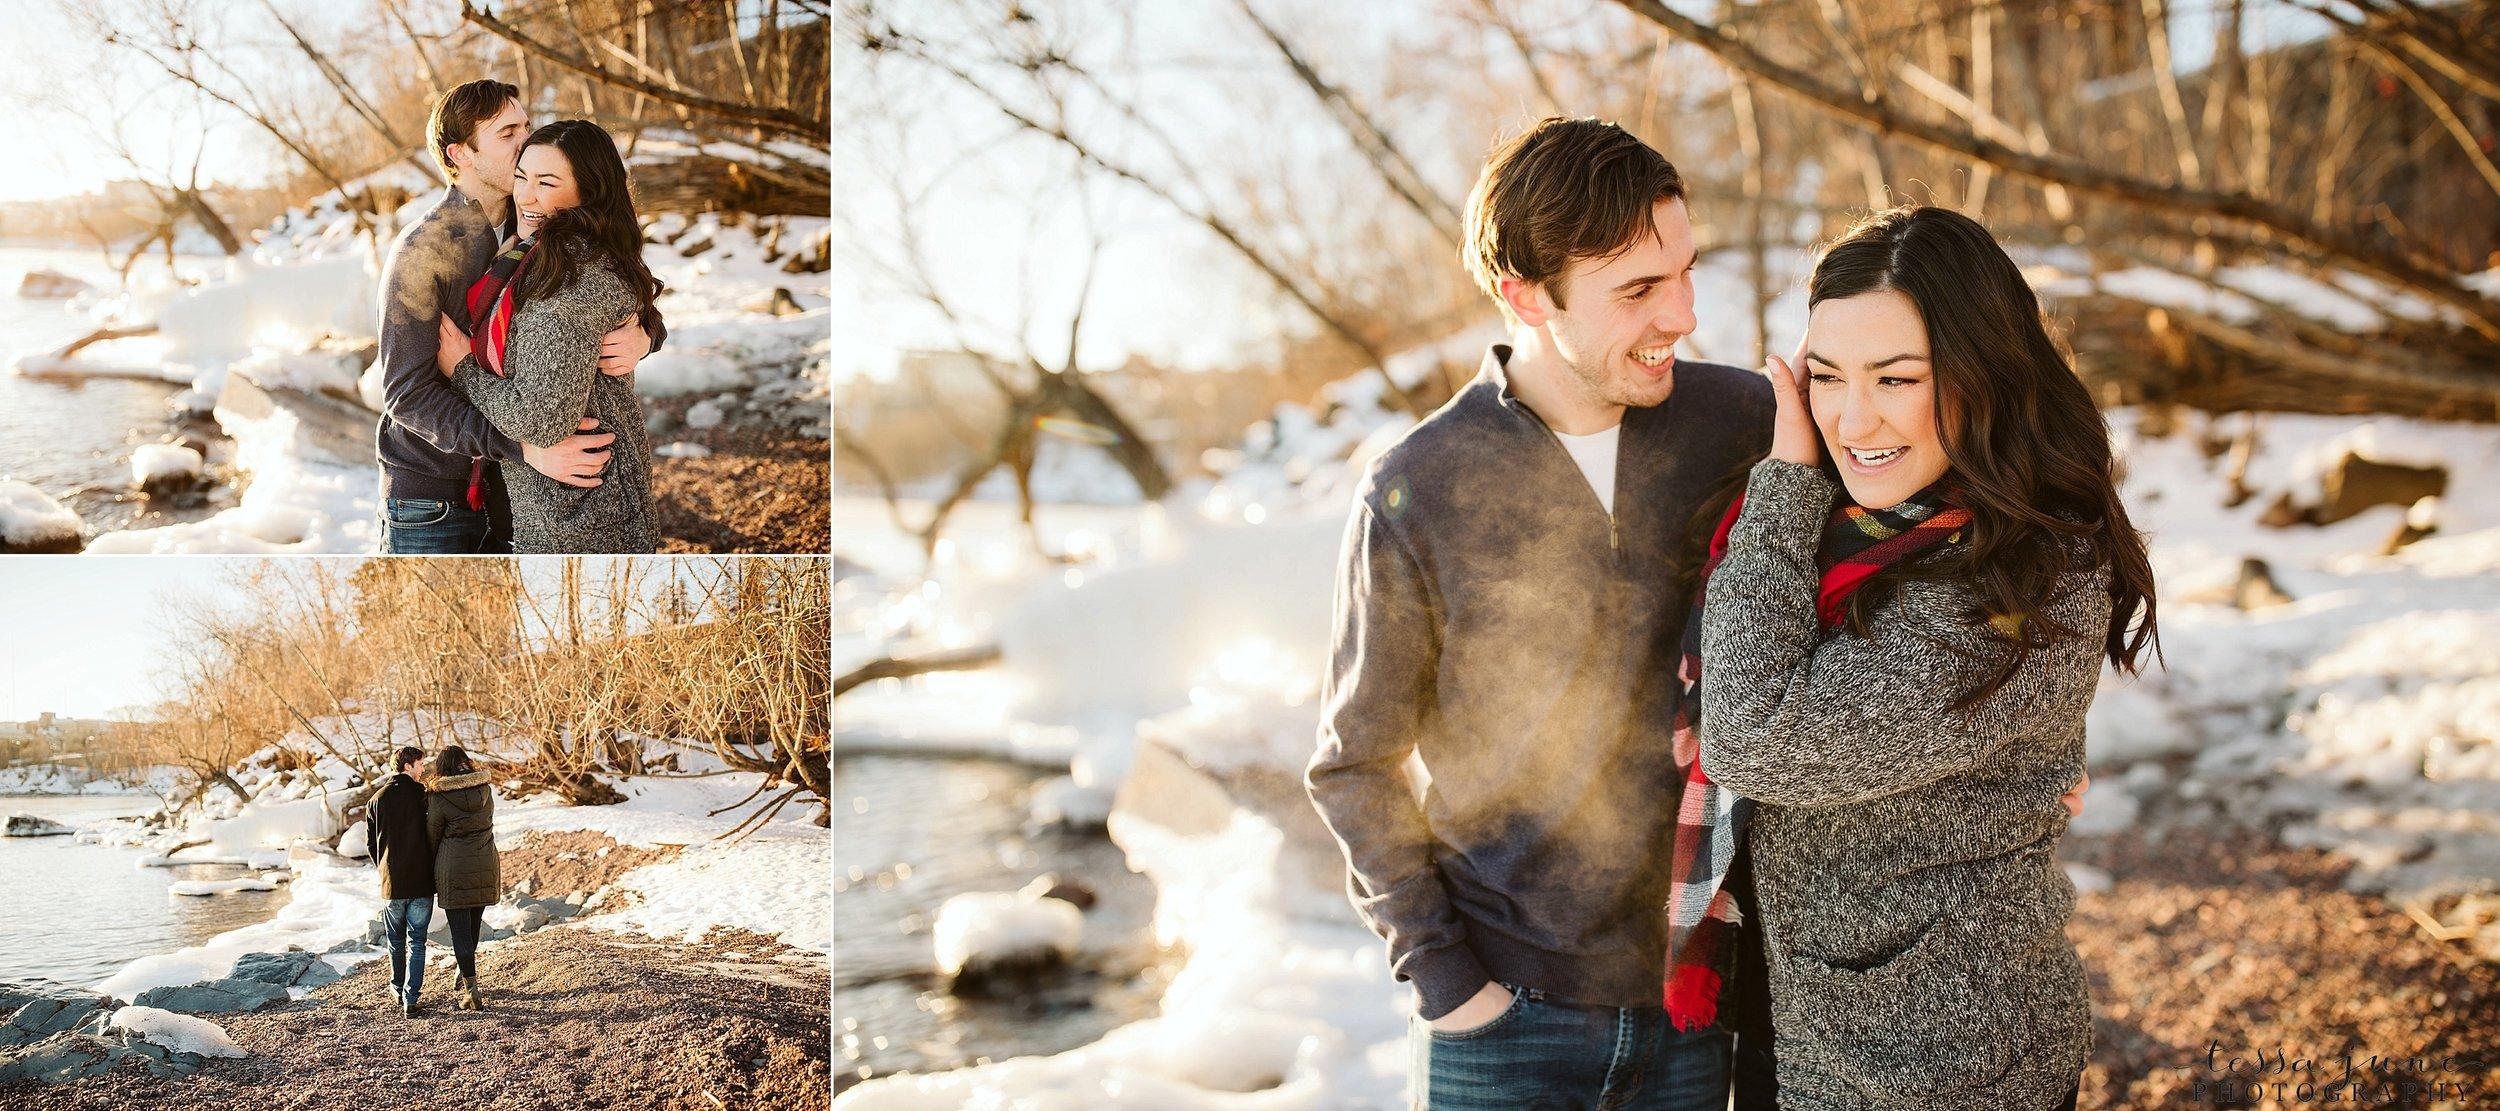 winter-duluth-engagement-at-park-pointe-snow-aly-alex-33.jpg